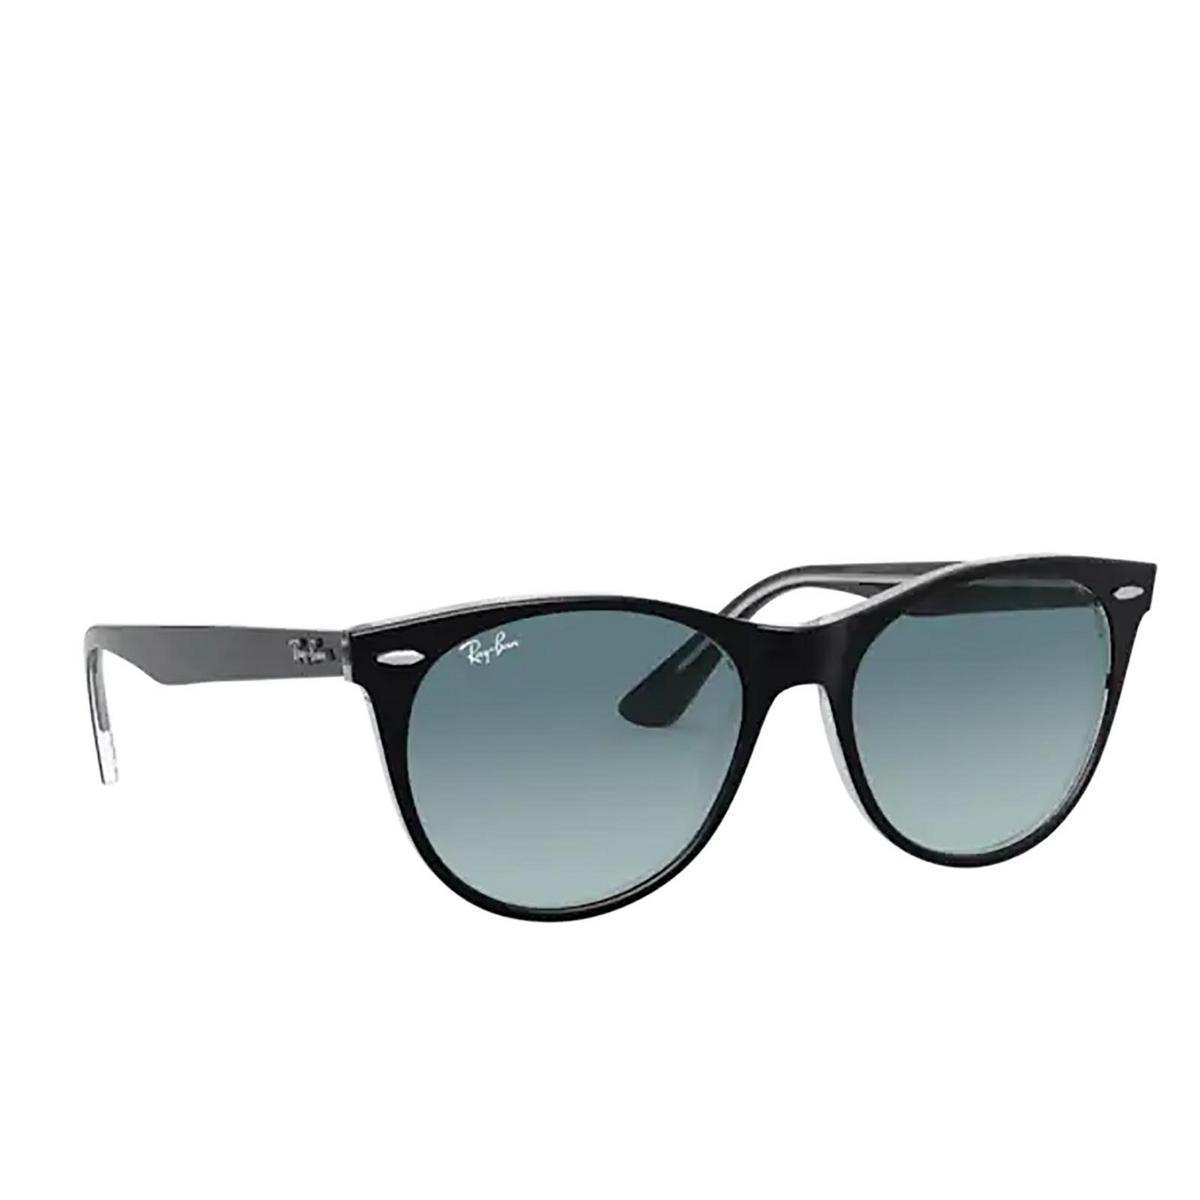 Ray-Ban® Round Sunglasses: Wayfarer Ii RB2185 color Black On Transparent 12943M - three-quarters view.